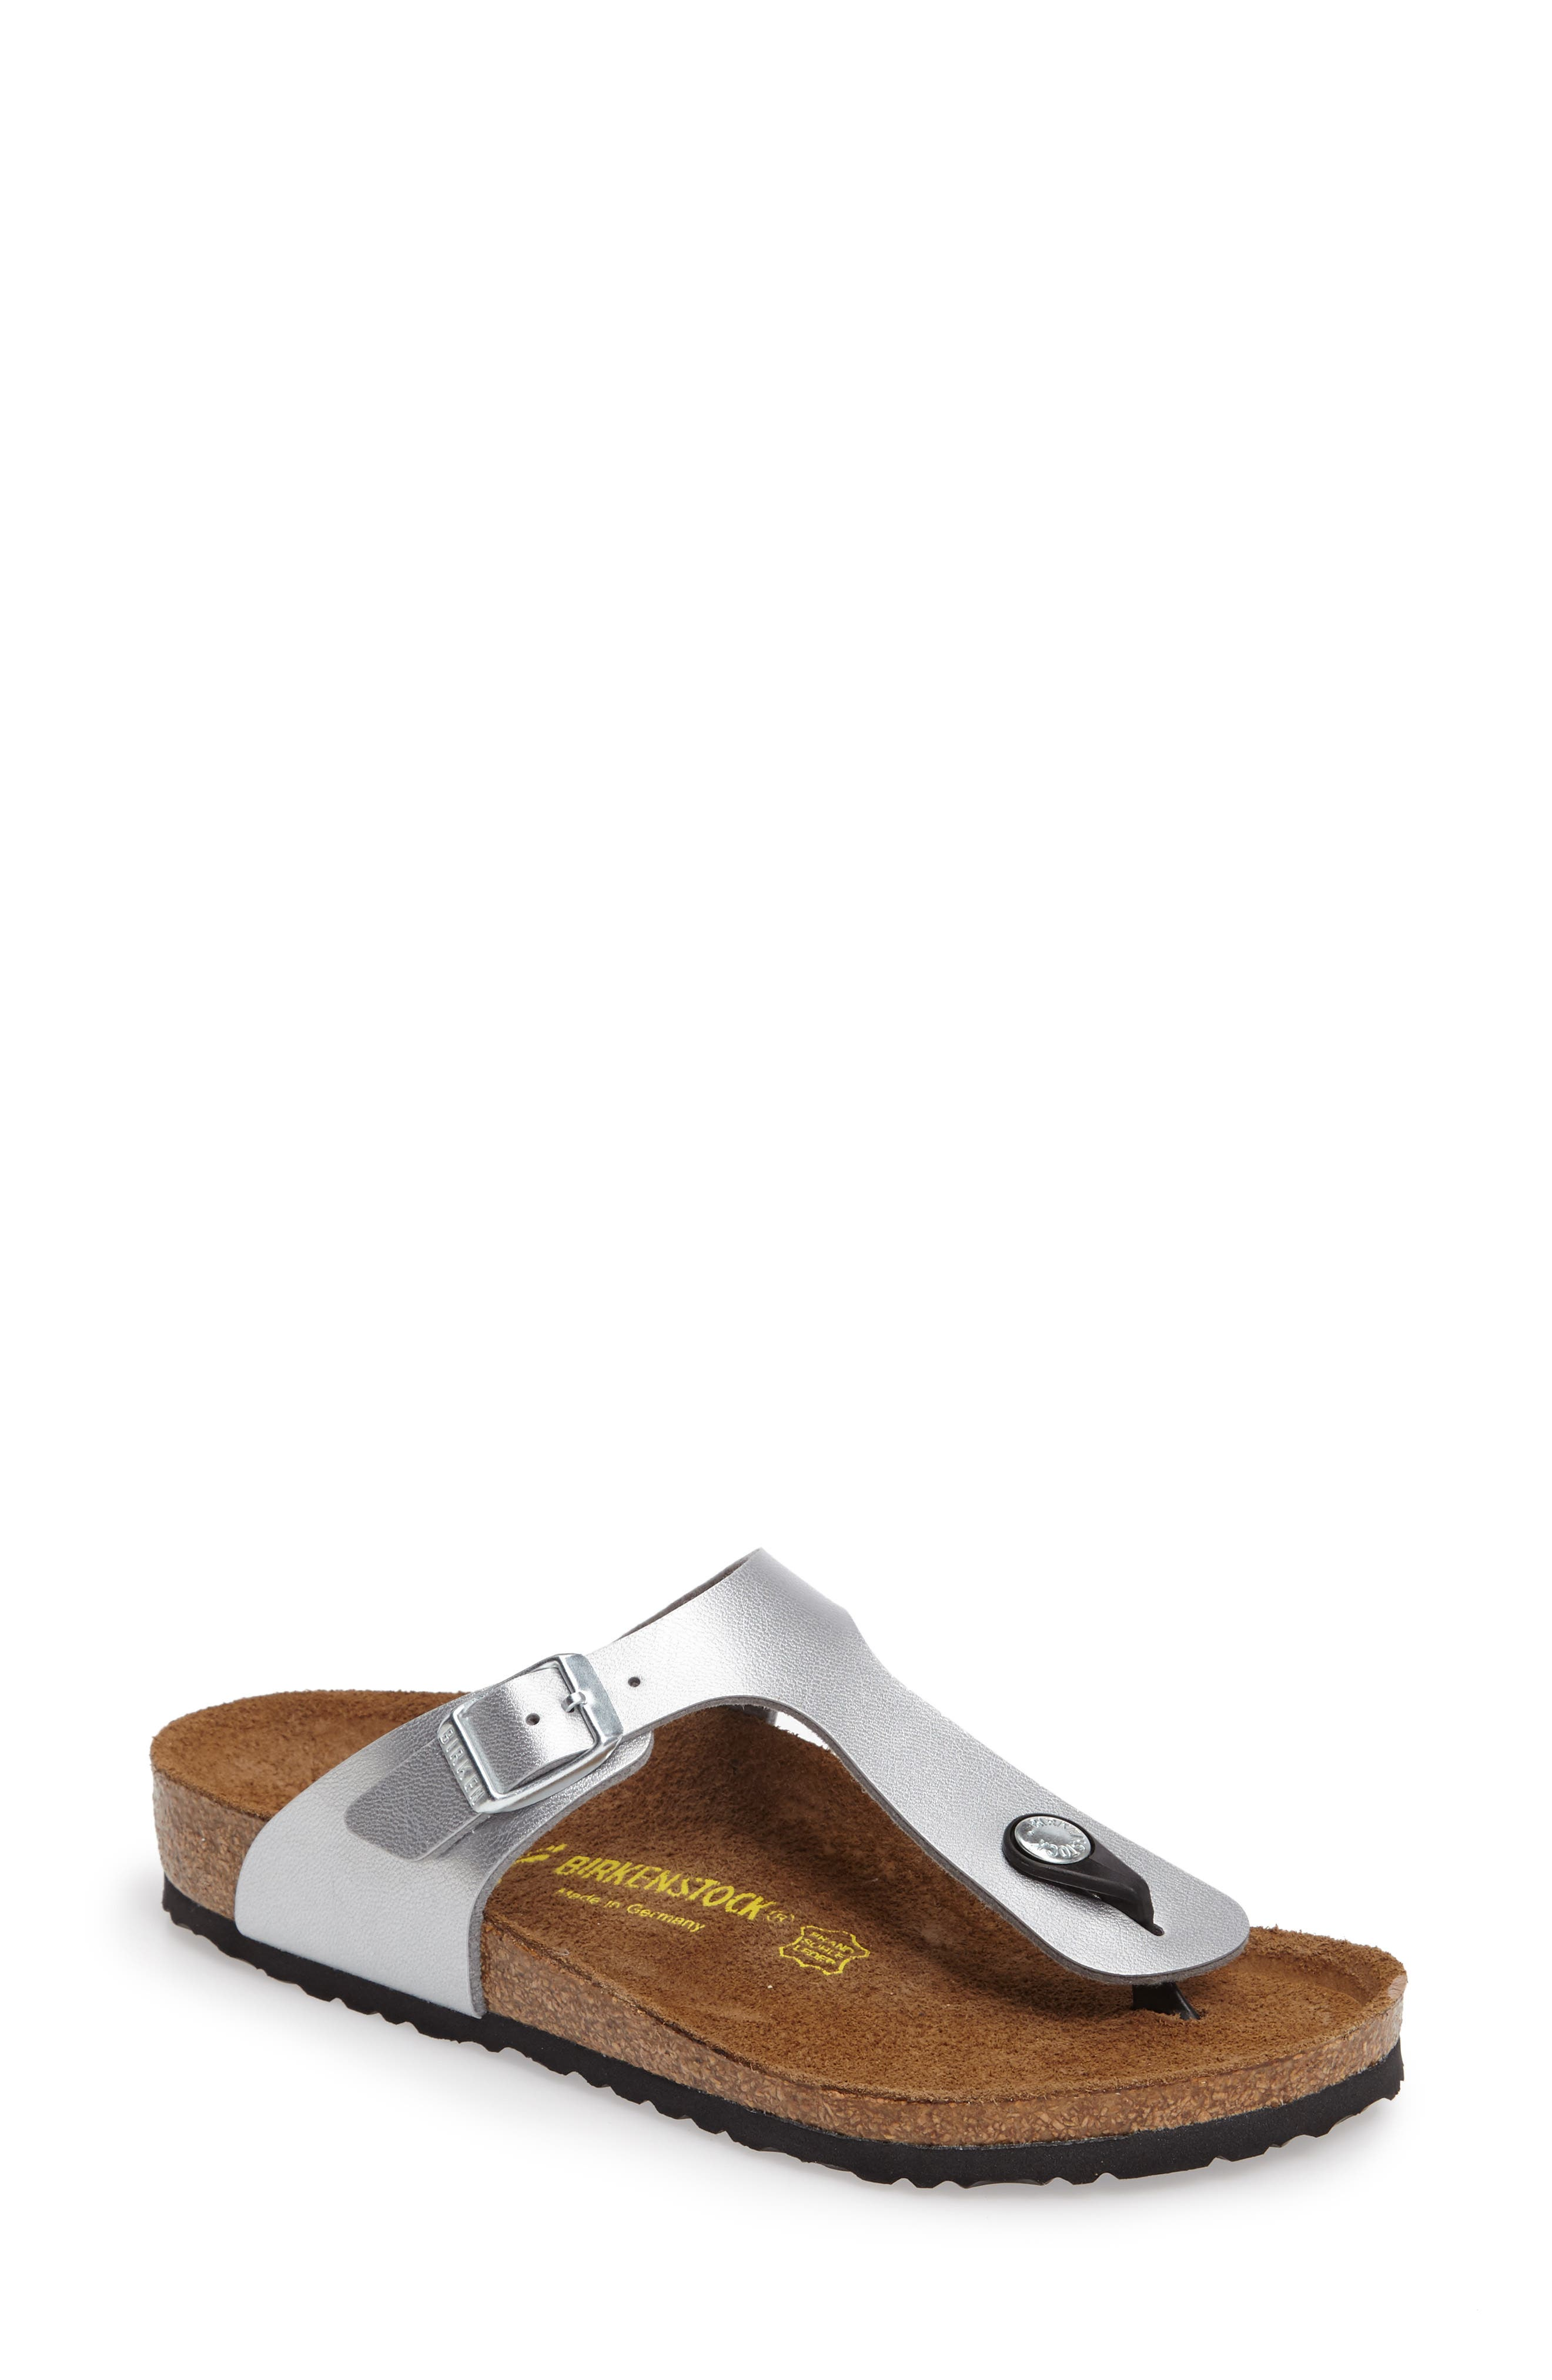 Gizeh Sandal,                         Main,                         color, Silver